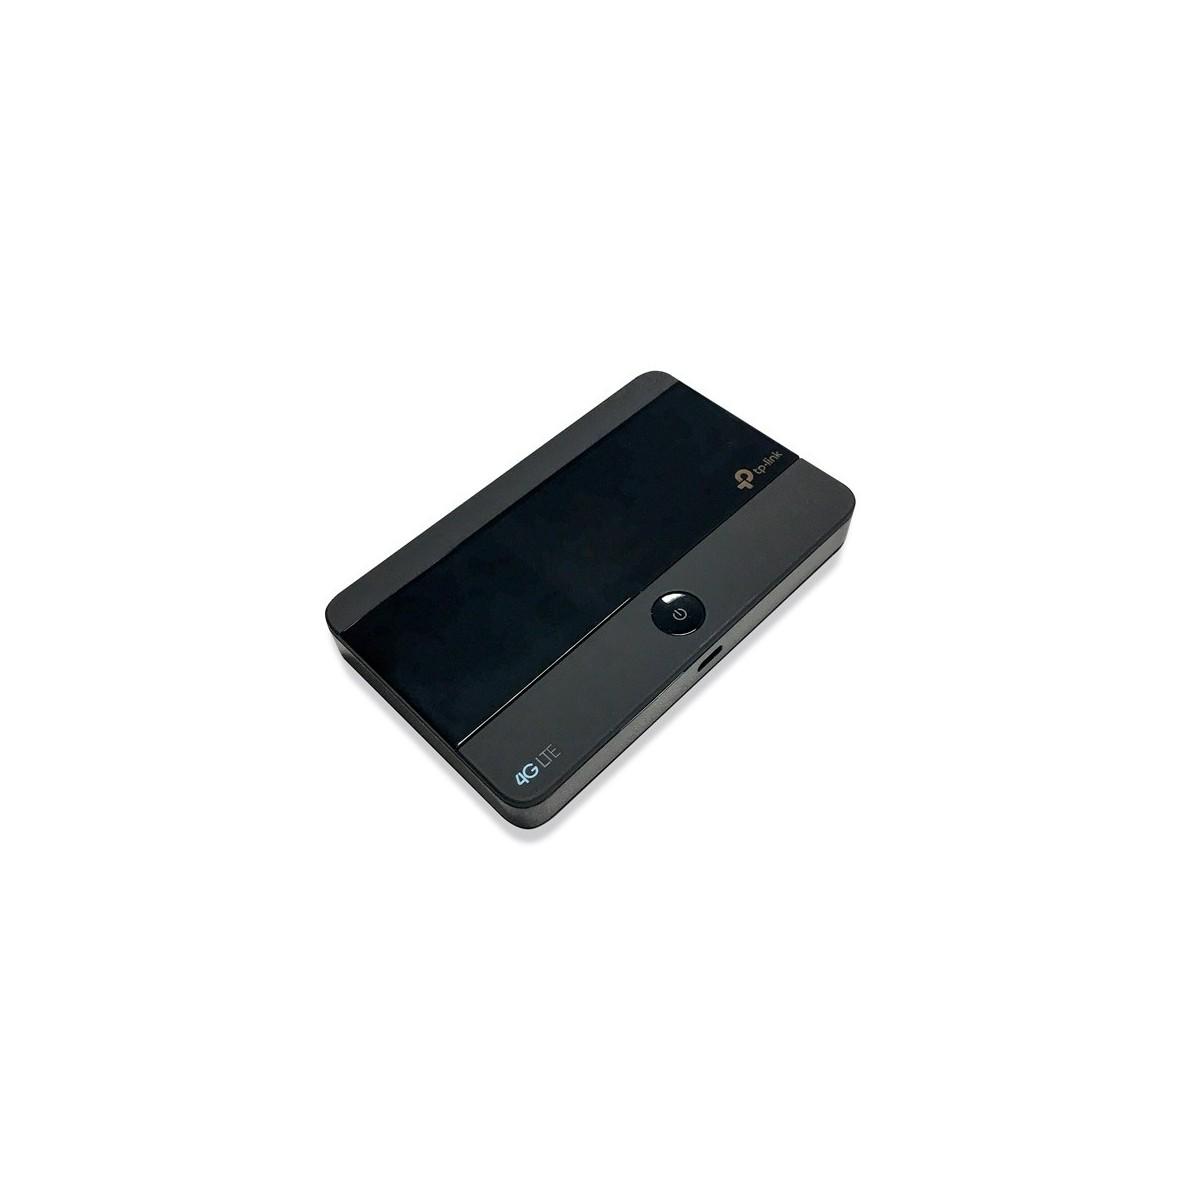 3G Mobile Wifi